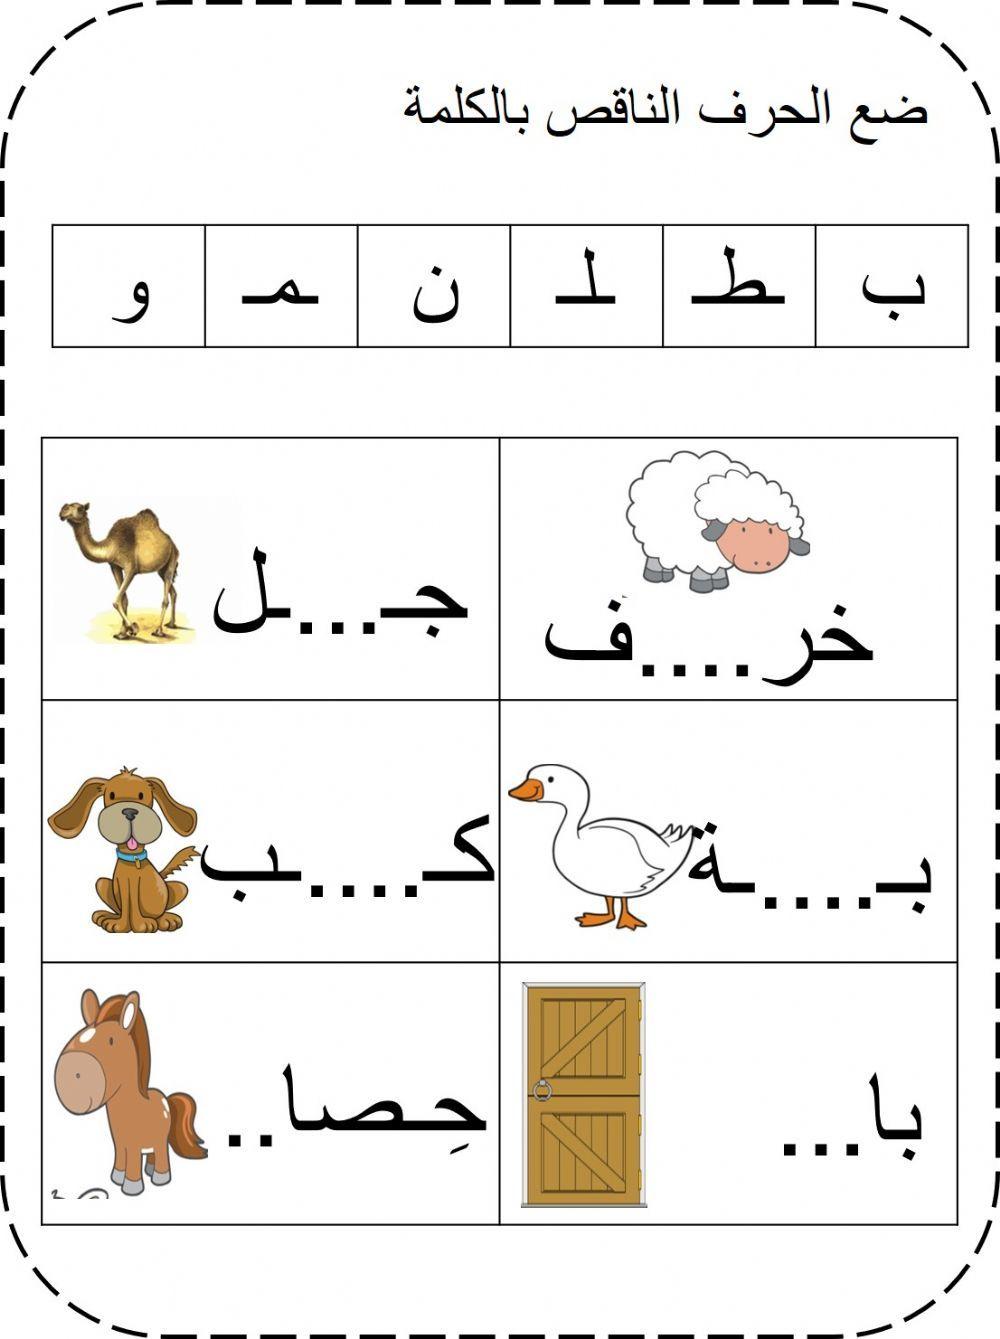 الحرف الناقص Online Worksheet For رياض أطفال You Can Do The Exercises Online Or Download The Work Arabic Kids Alphabet Activities Kindergarten Learning Arabic